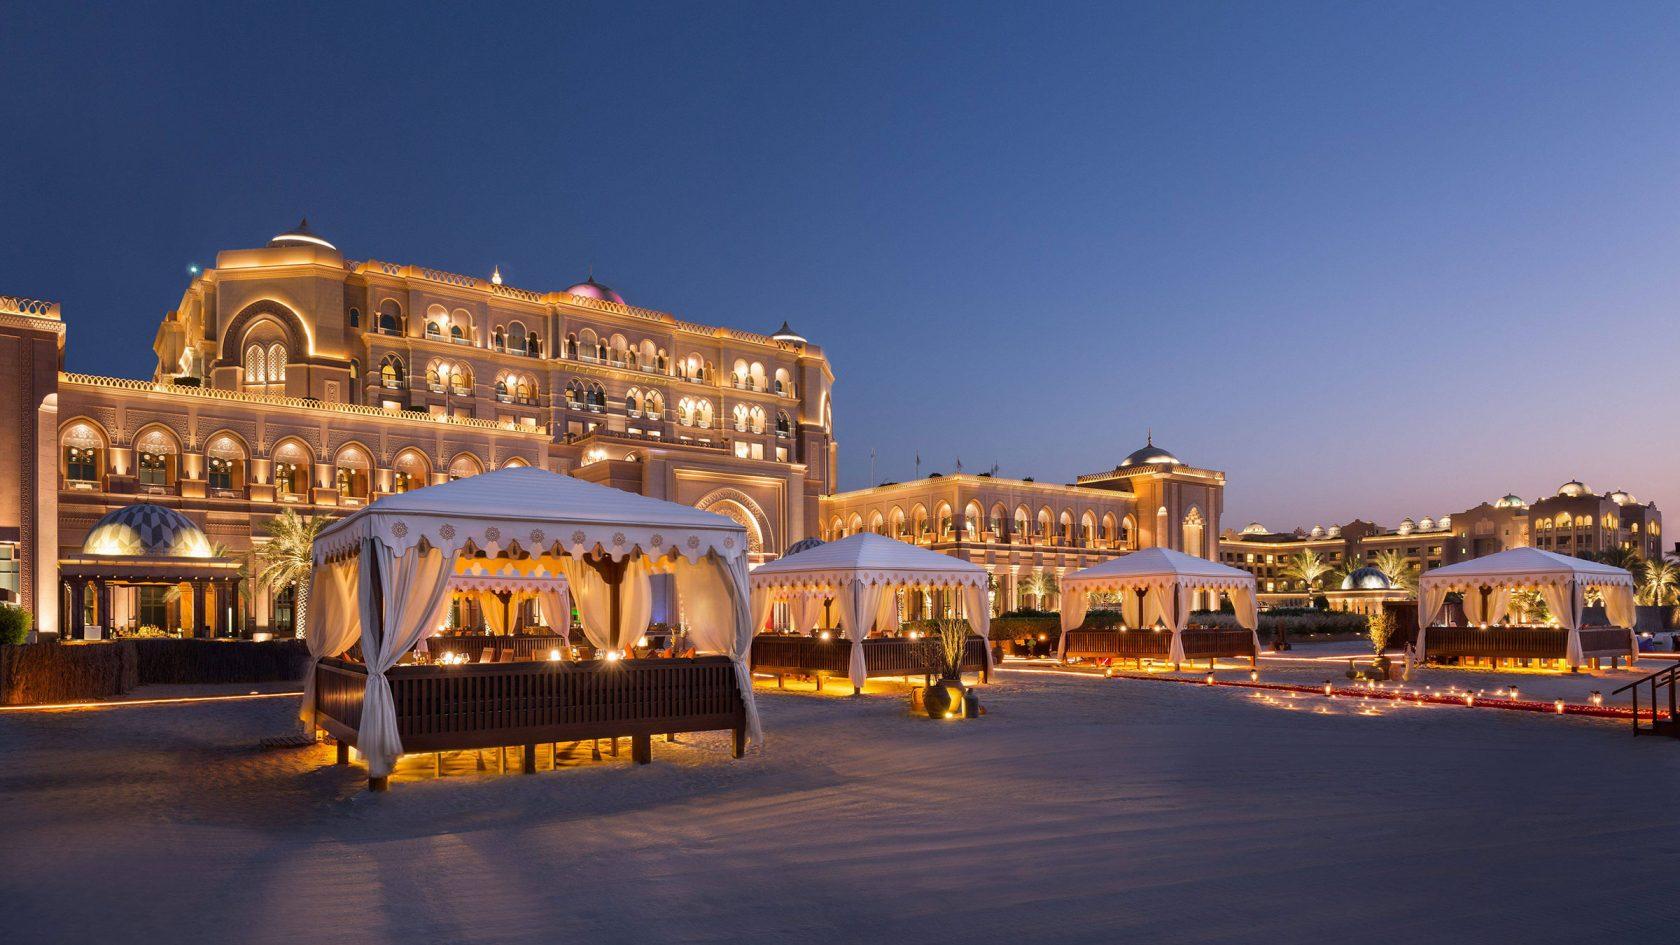 Mandarin Oriental Abu Dhabi